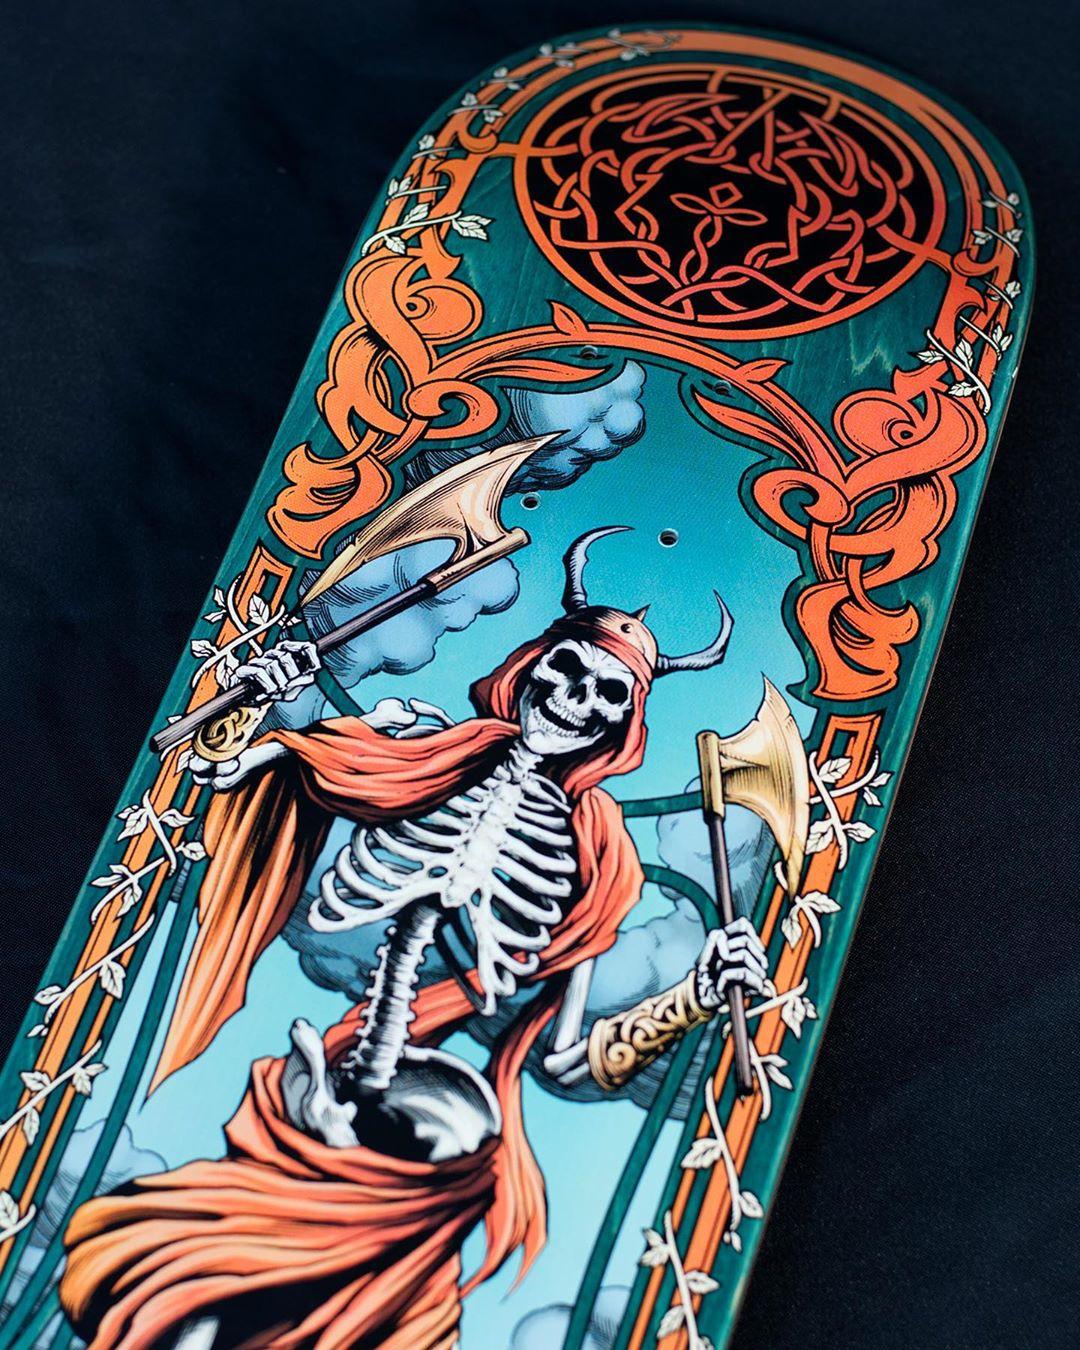 Celtic Pro Series By Darkstar Skateboards 5